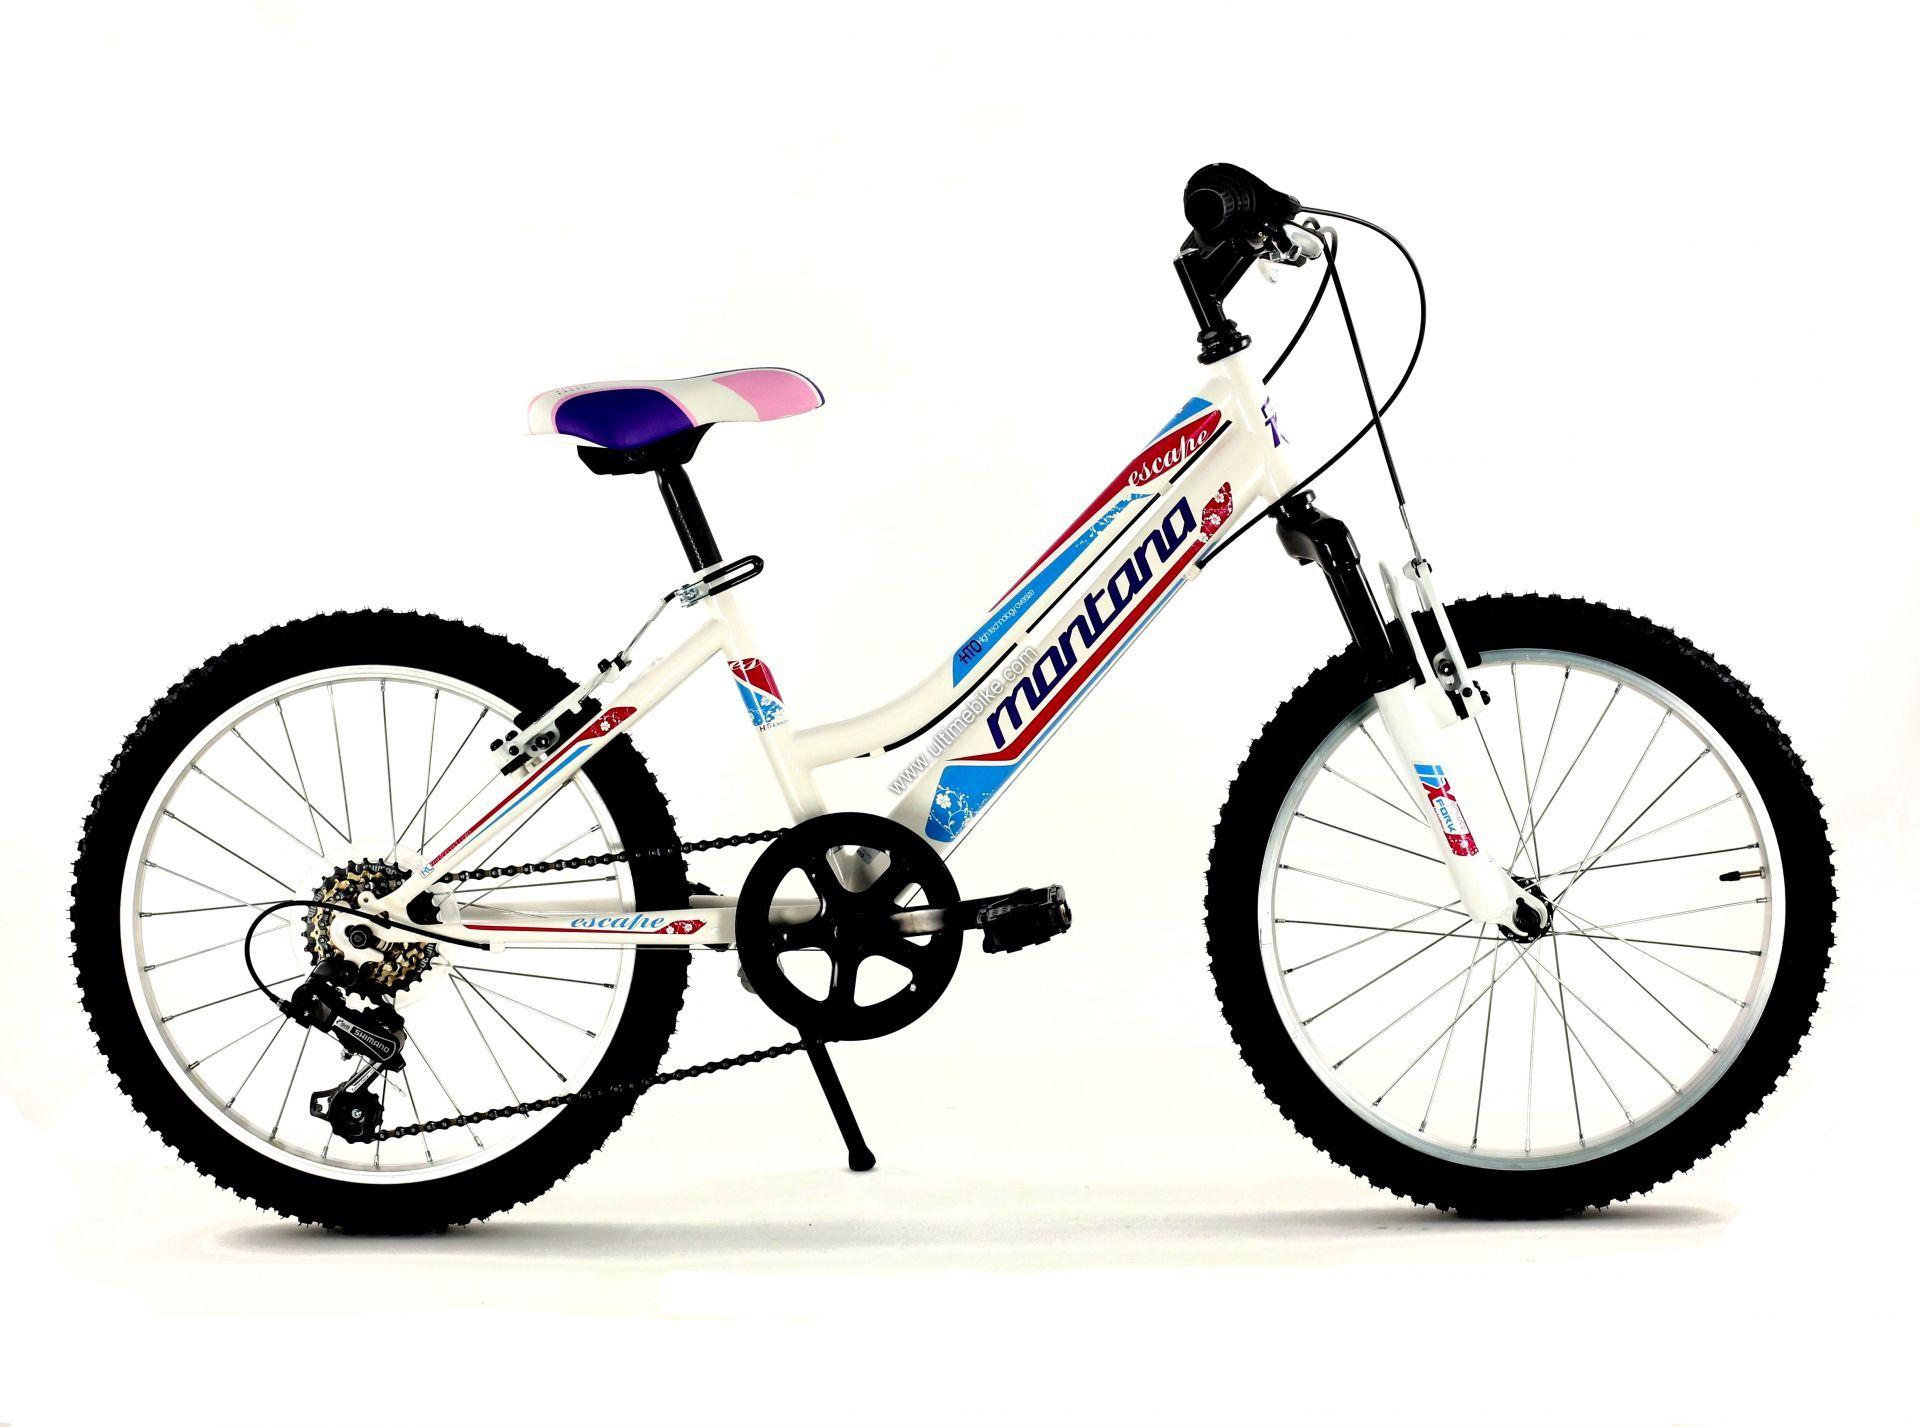 Velo Enfant 20. velo 20 pouces hubert cycles. velo enfant 20 flamme ... c05260217a80